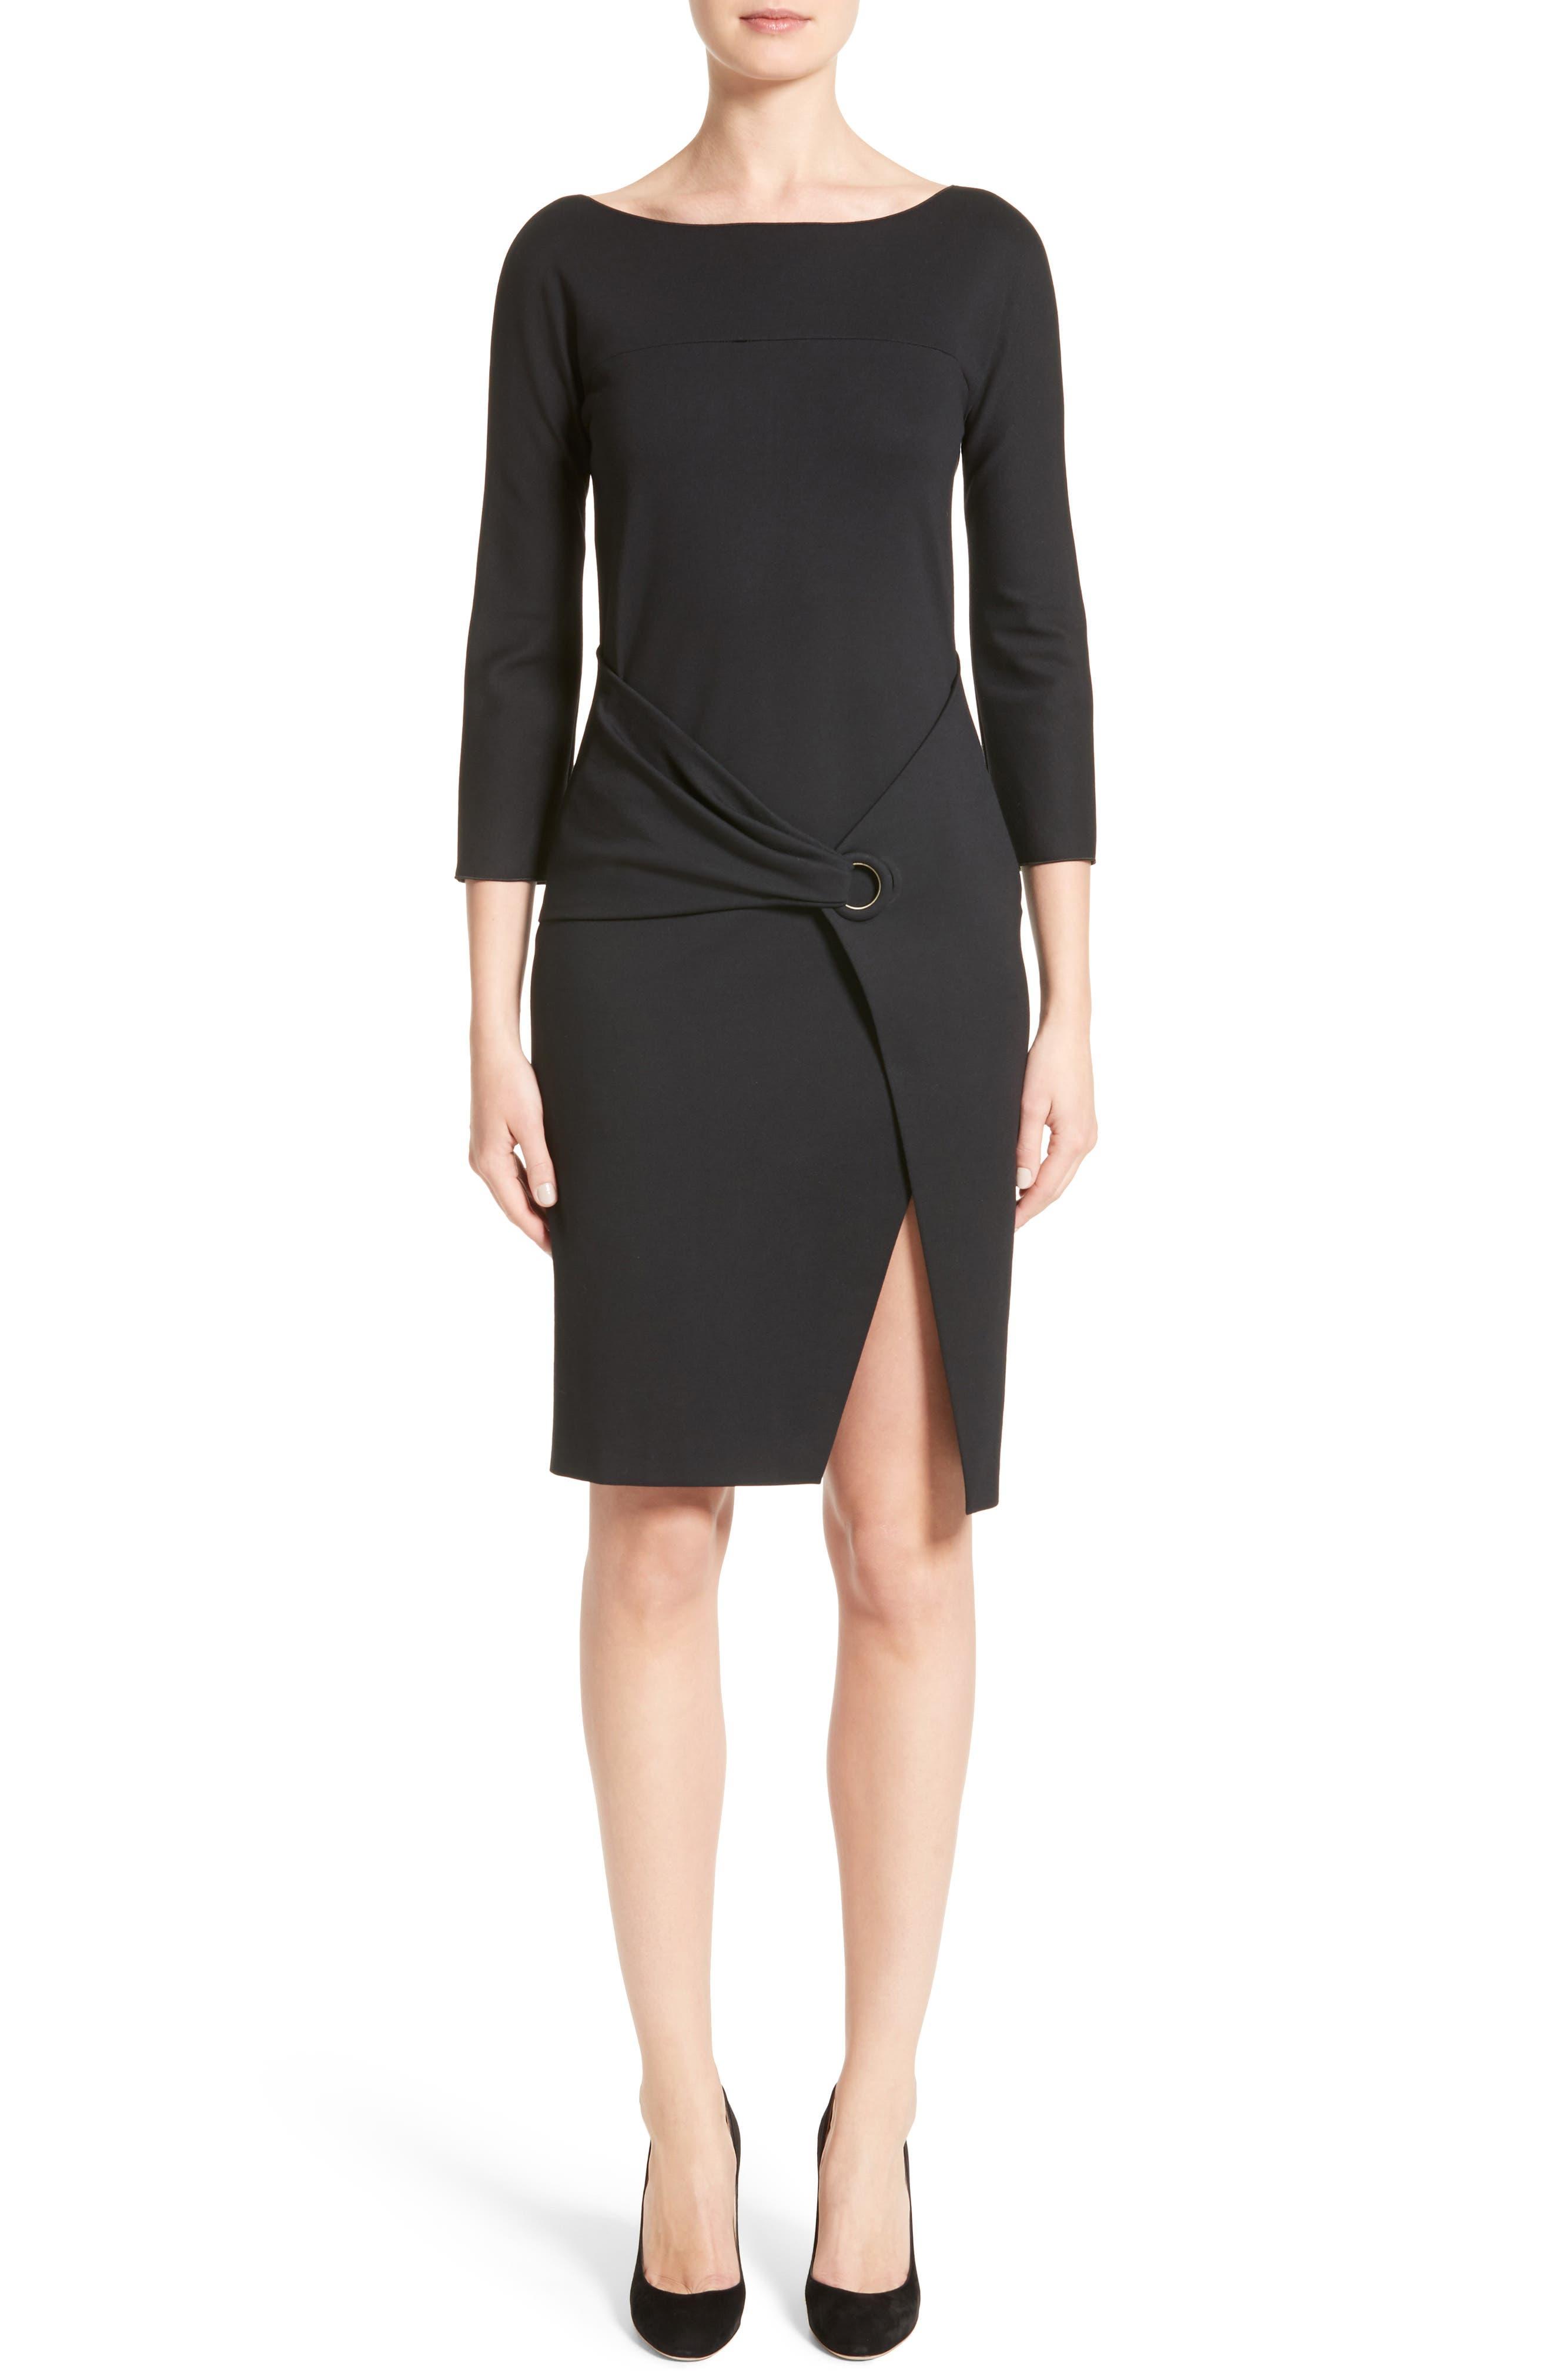 Grommet Detail Milano Jersey Dress,                             Main thumbnail 1, color,                             001